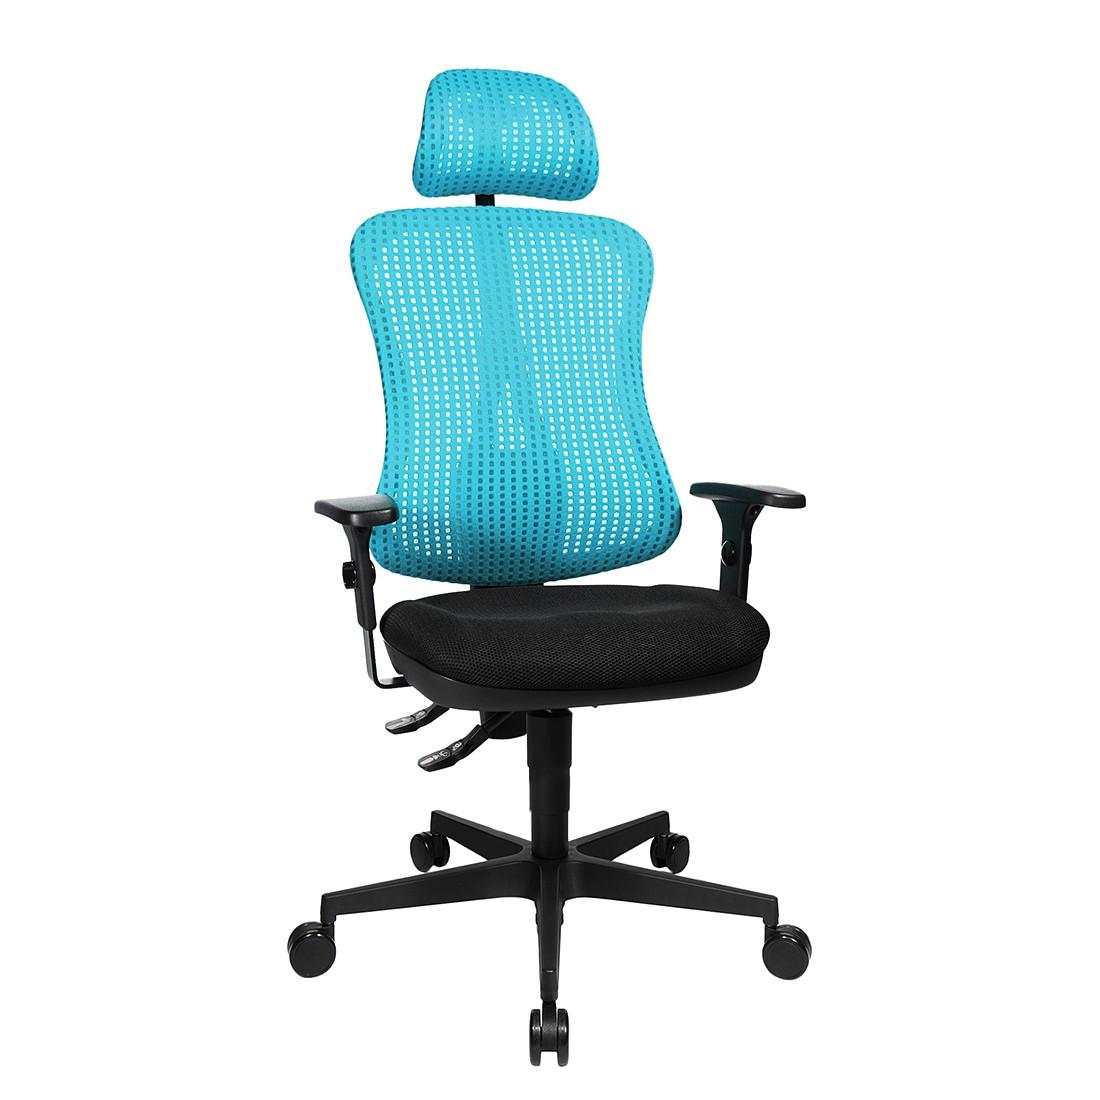 home24 Buerodrehstuhl Head Point | Büro > Bürostühle und Sessel  | Blau | Topstar